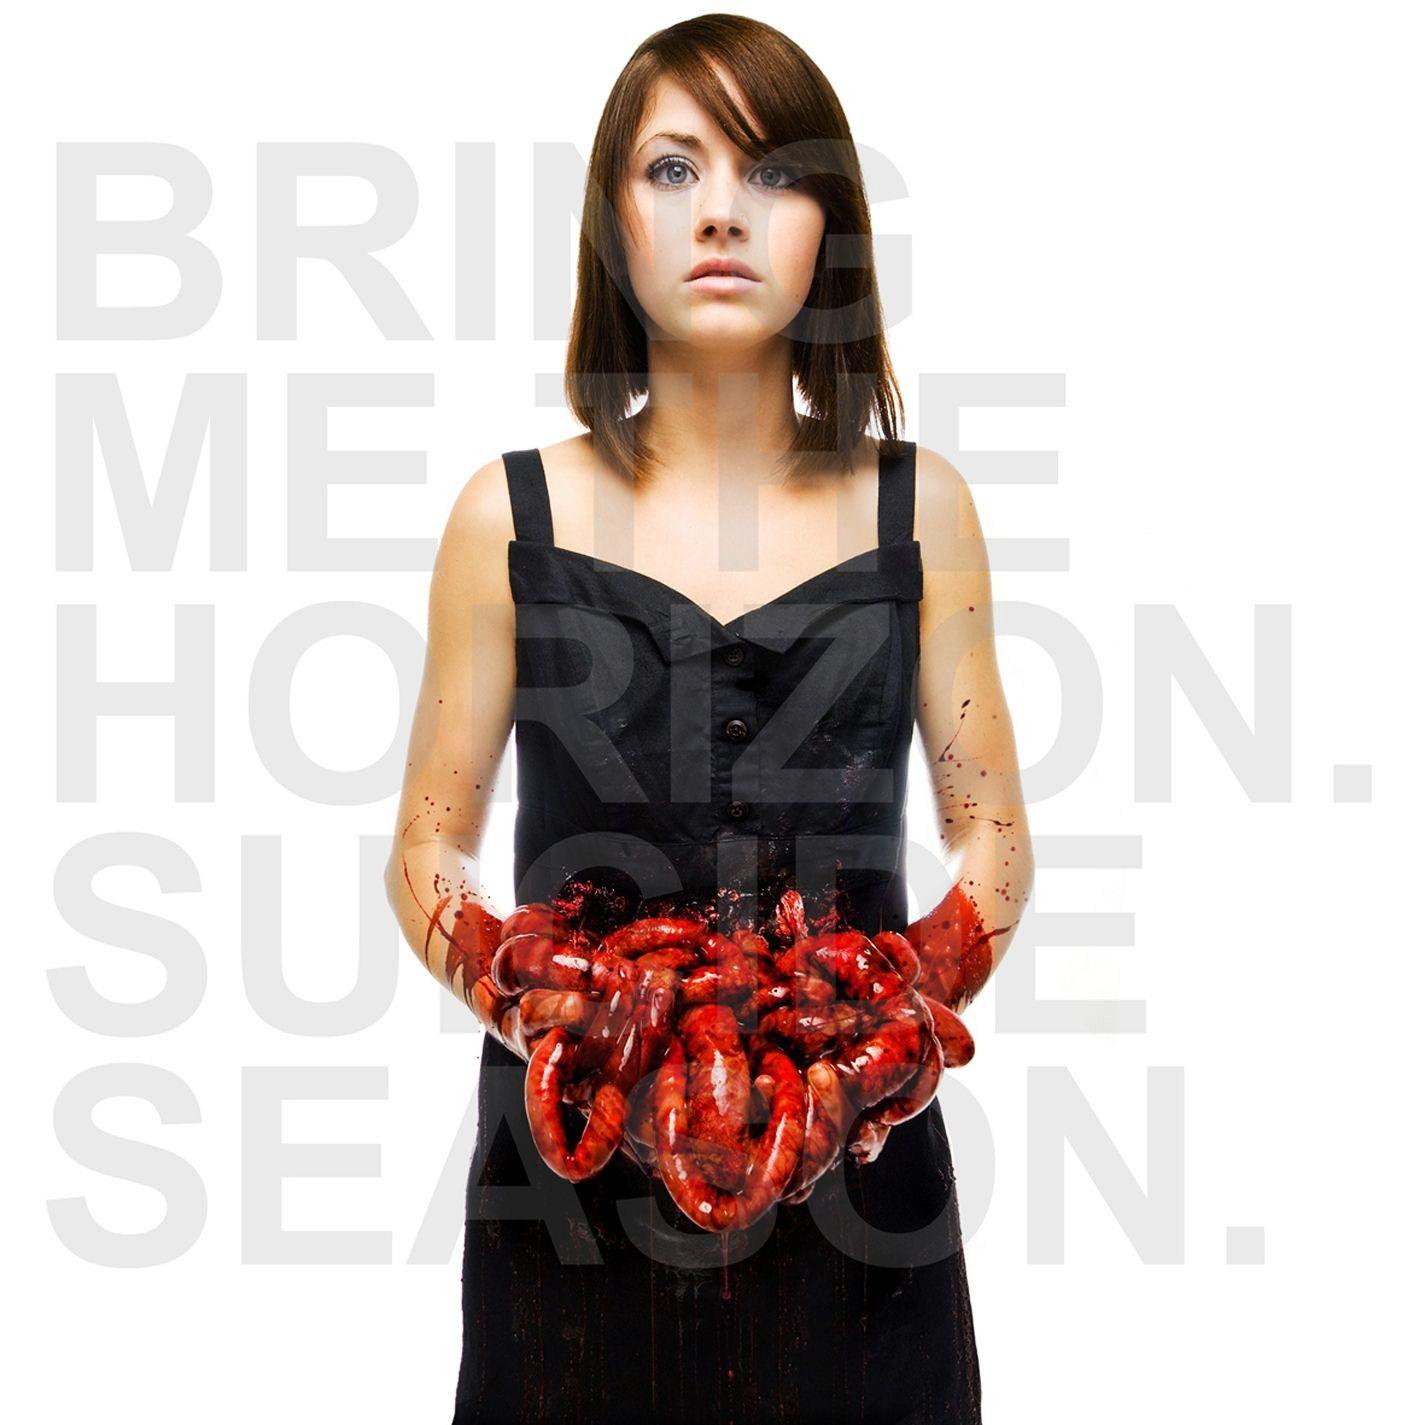 Bring Me The Horizon - Suicide Season (2008) | Jordan's ...